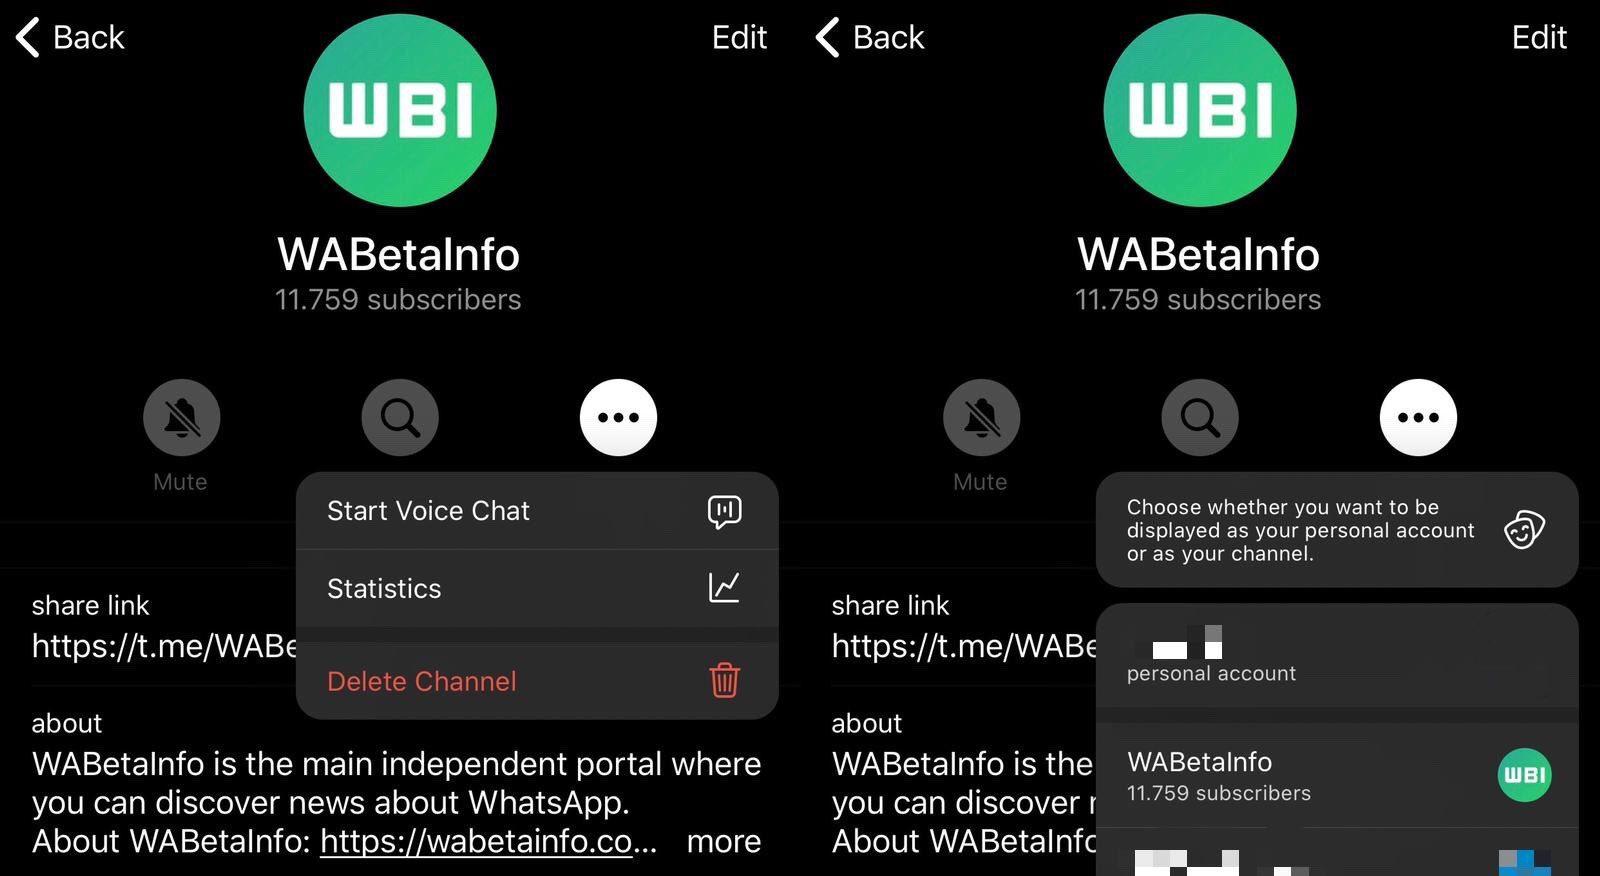 clubhouse en Telegram wabetainfo universosamsung